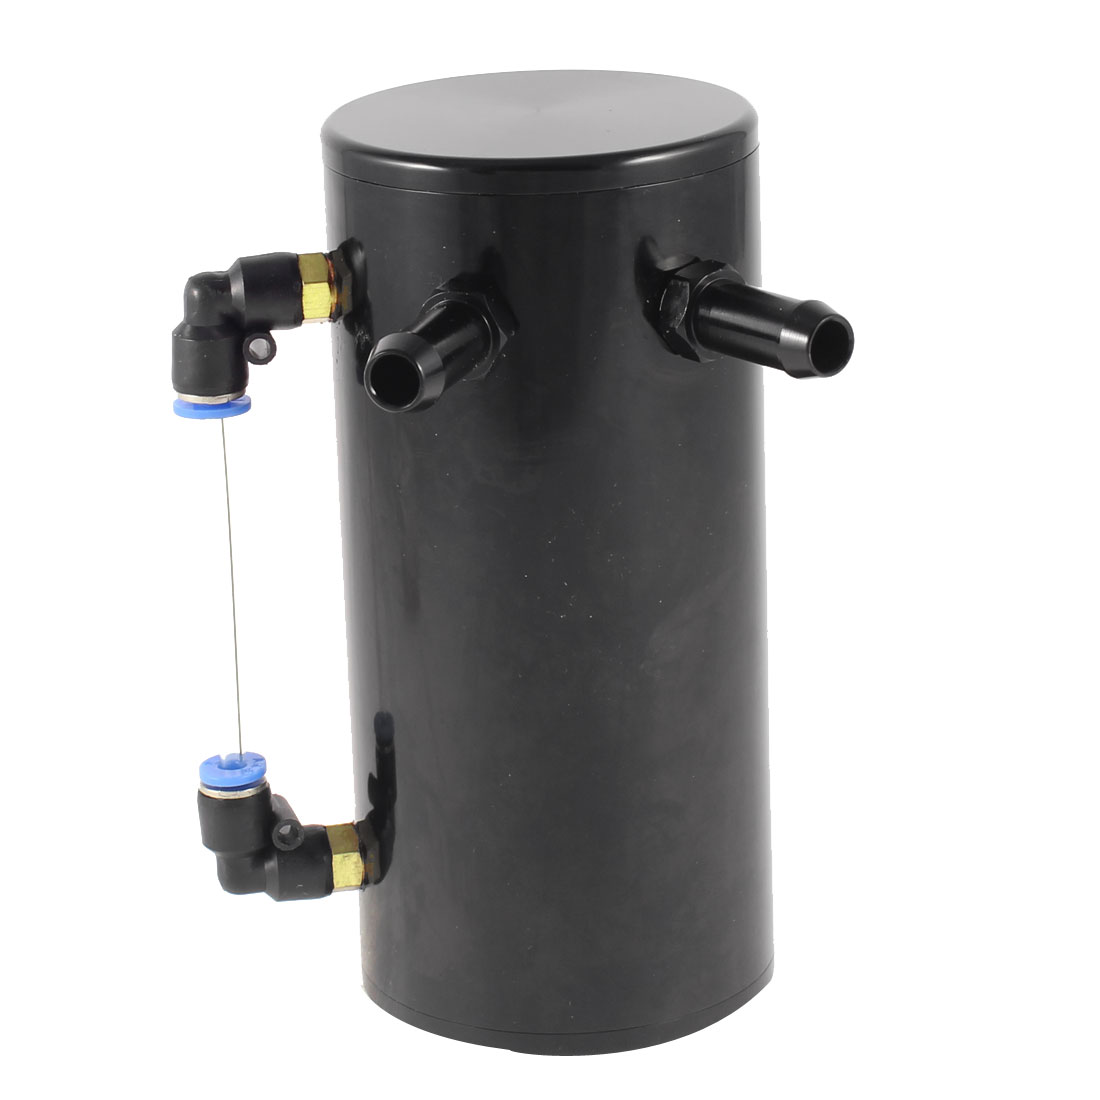 Black Alloy Car Auto Engine Cylinder Fluid Gas Reservoir Oiler Oil Catch Tank